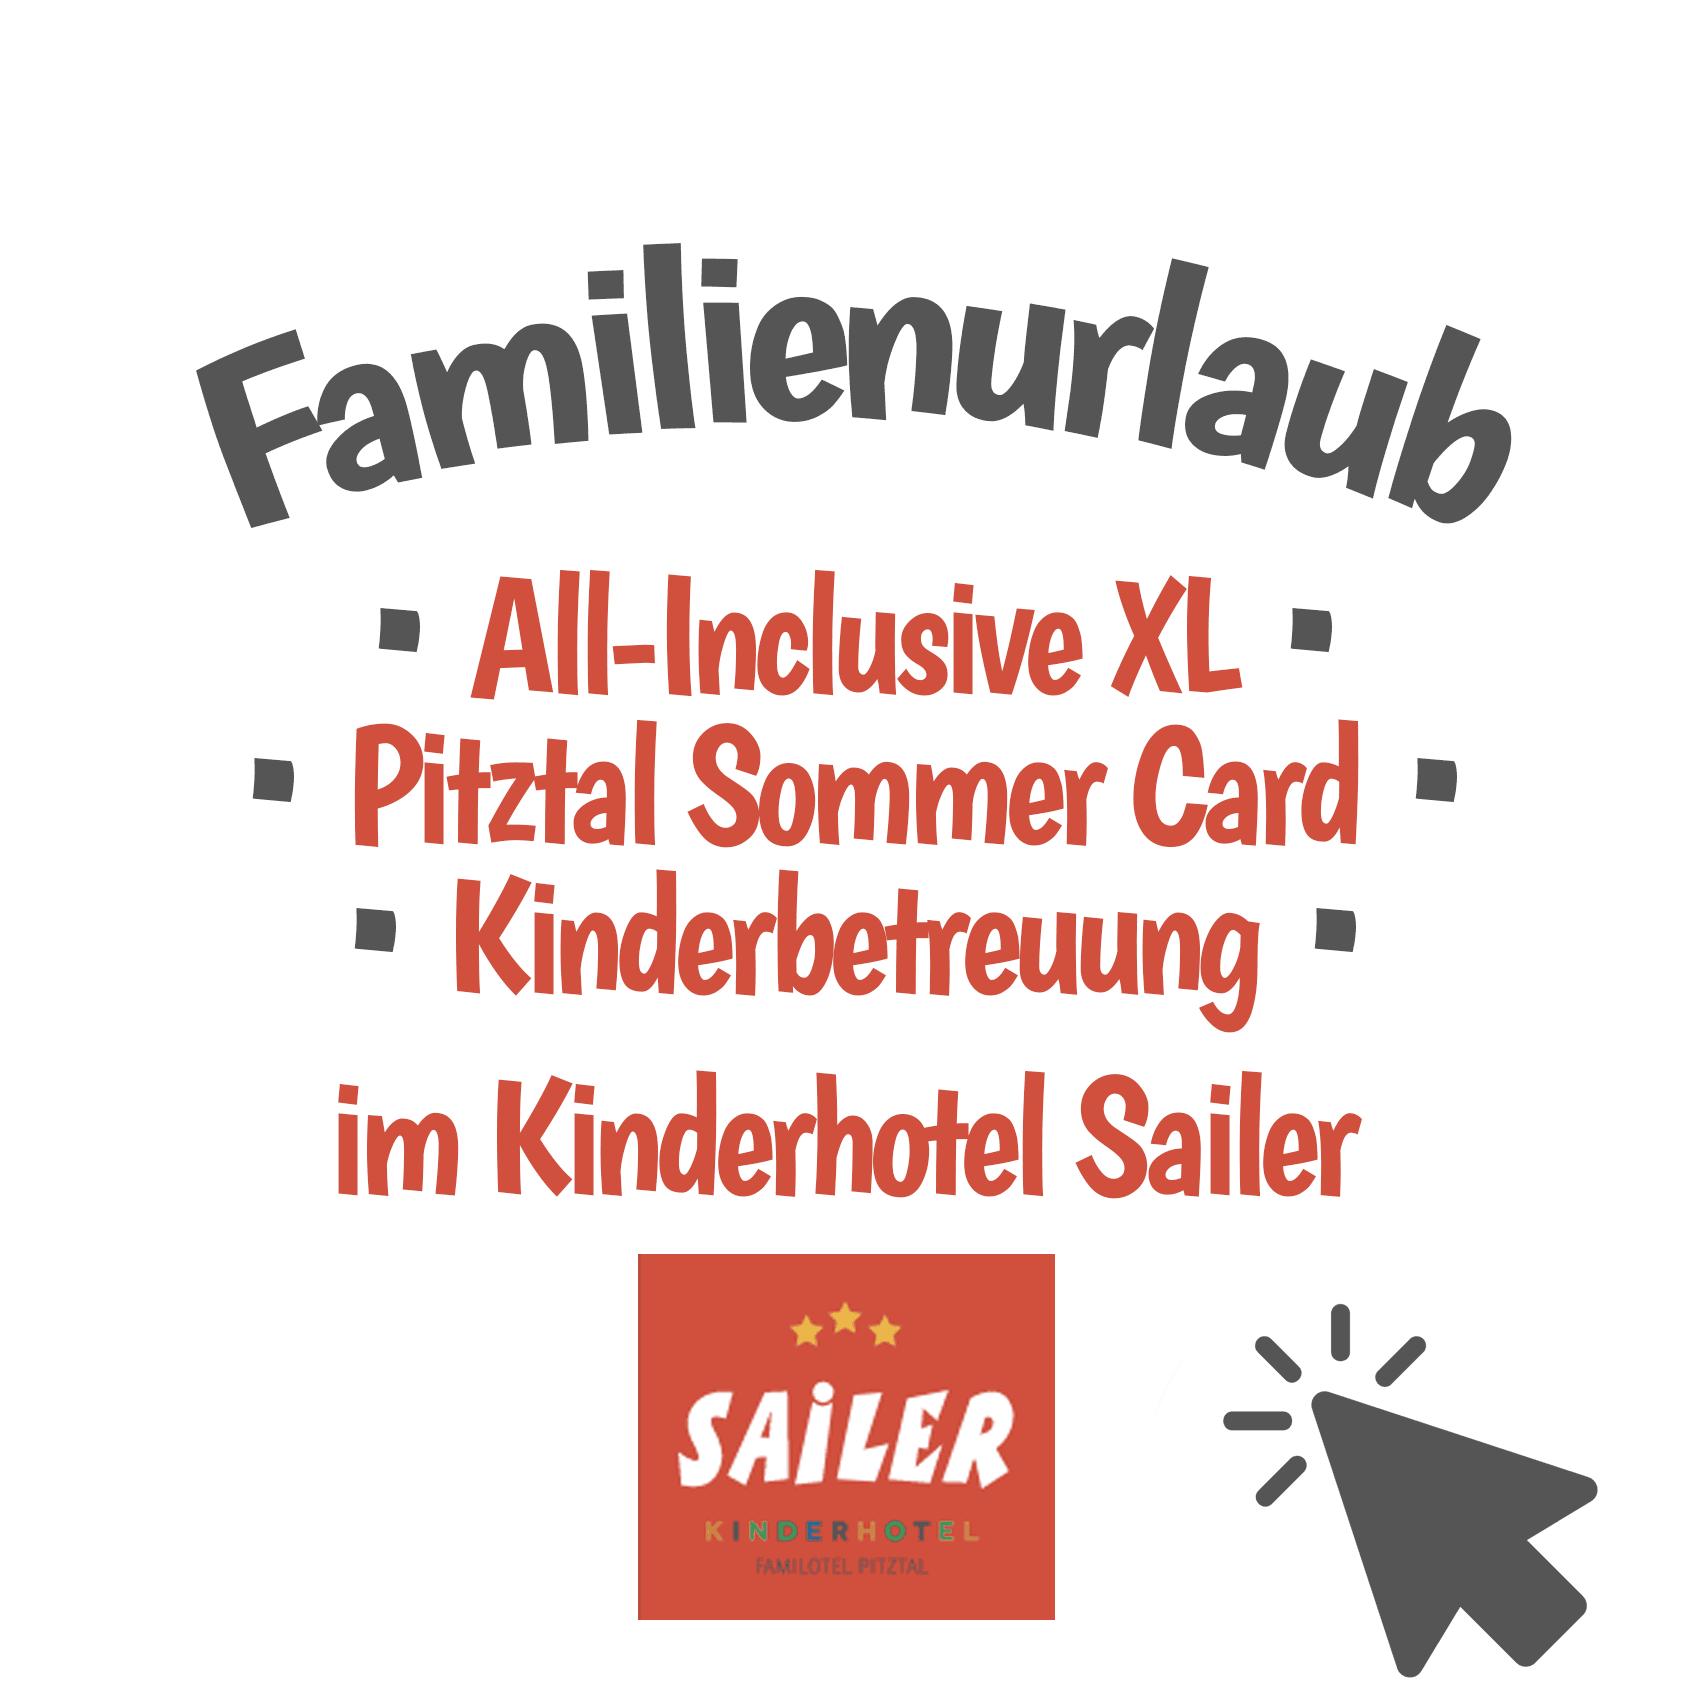 https://www.sailer-und-stefan.at/sites/default/files/revslider/image/stoerer_All_Inclusive_XL_1.png